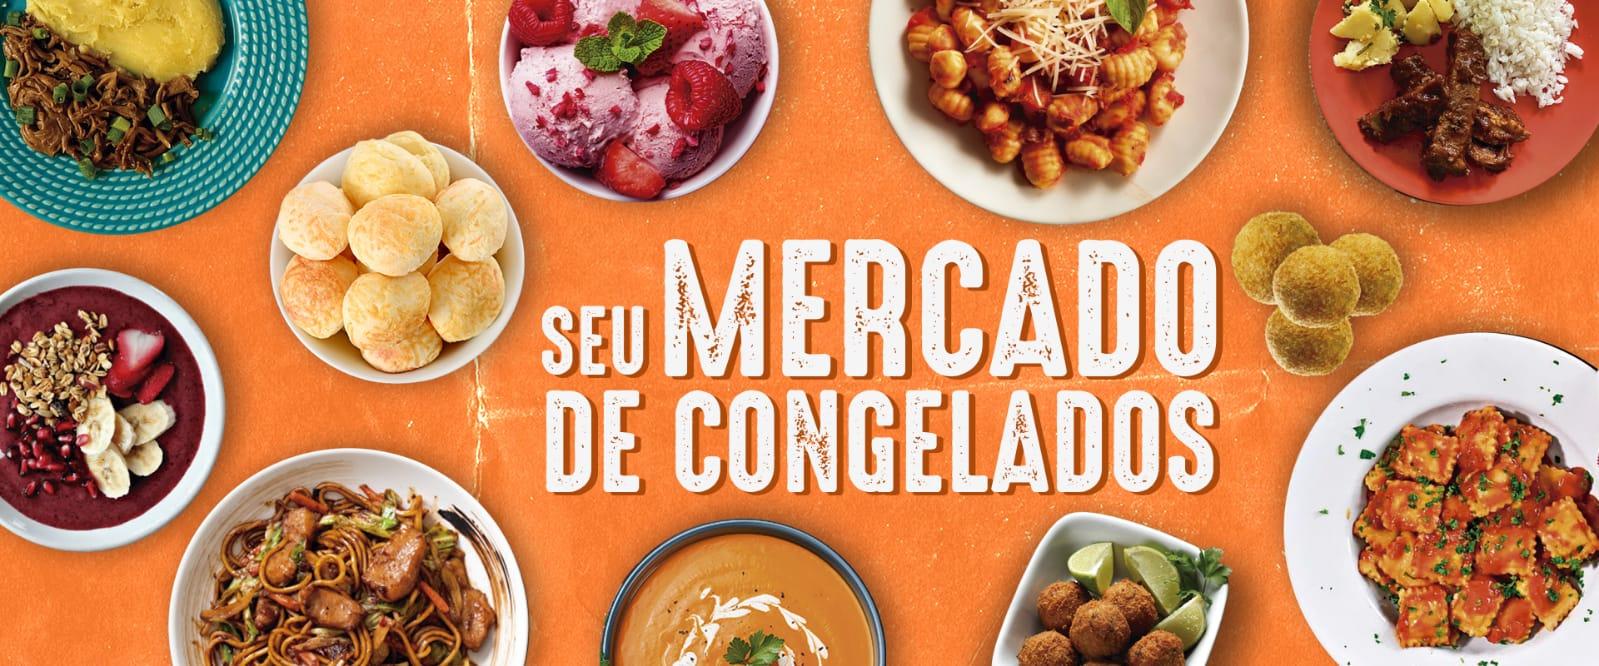 MERCADO DE CONGELADOS